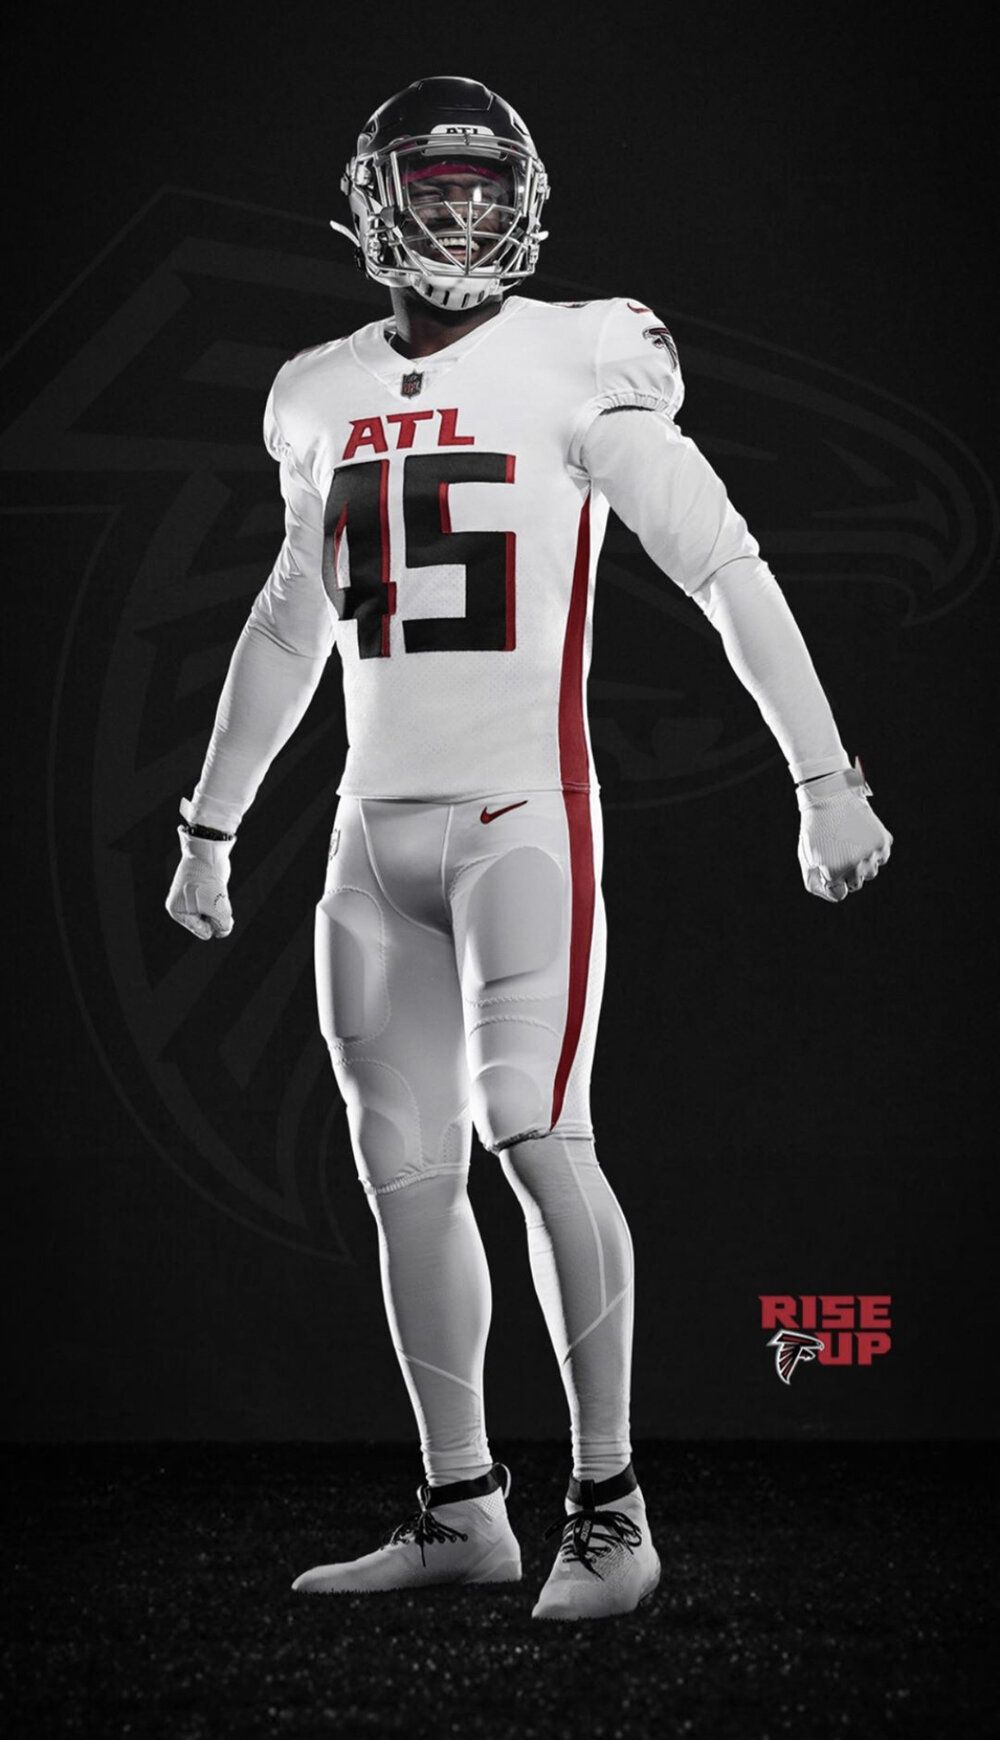 Atlanta Falcons New Uniforms Uniswag In 2020 Nfl Outfits Atlanta Falcons Atlanta Falcons Players